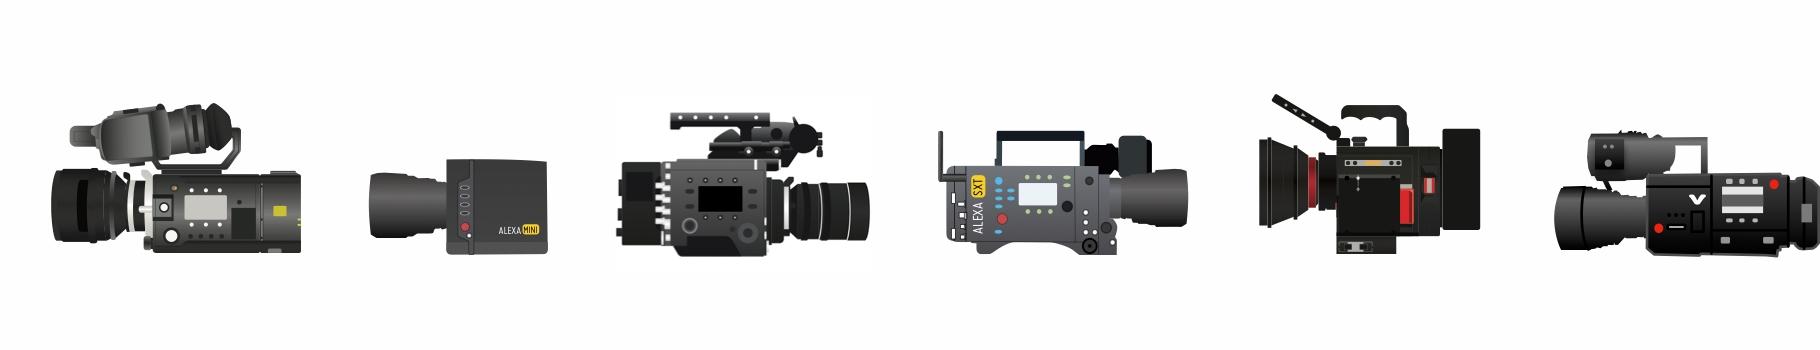 3 Ways to Receive Camera Metadata at the DIT Cart | Pomfort